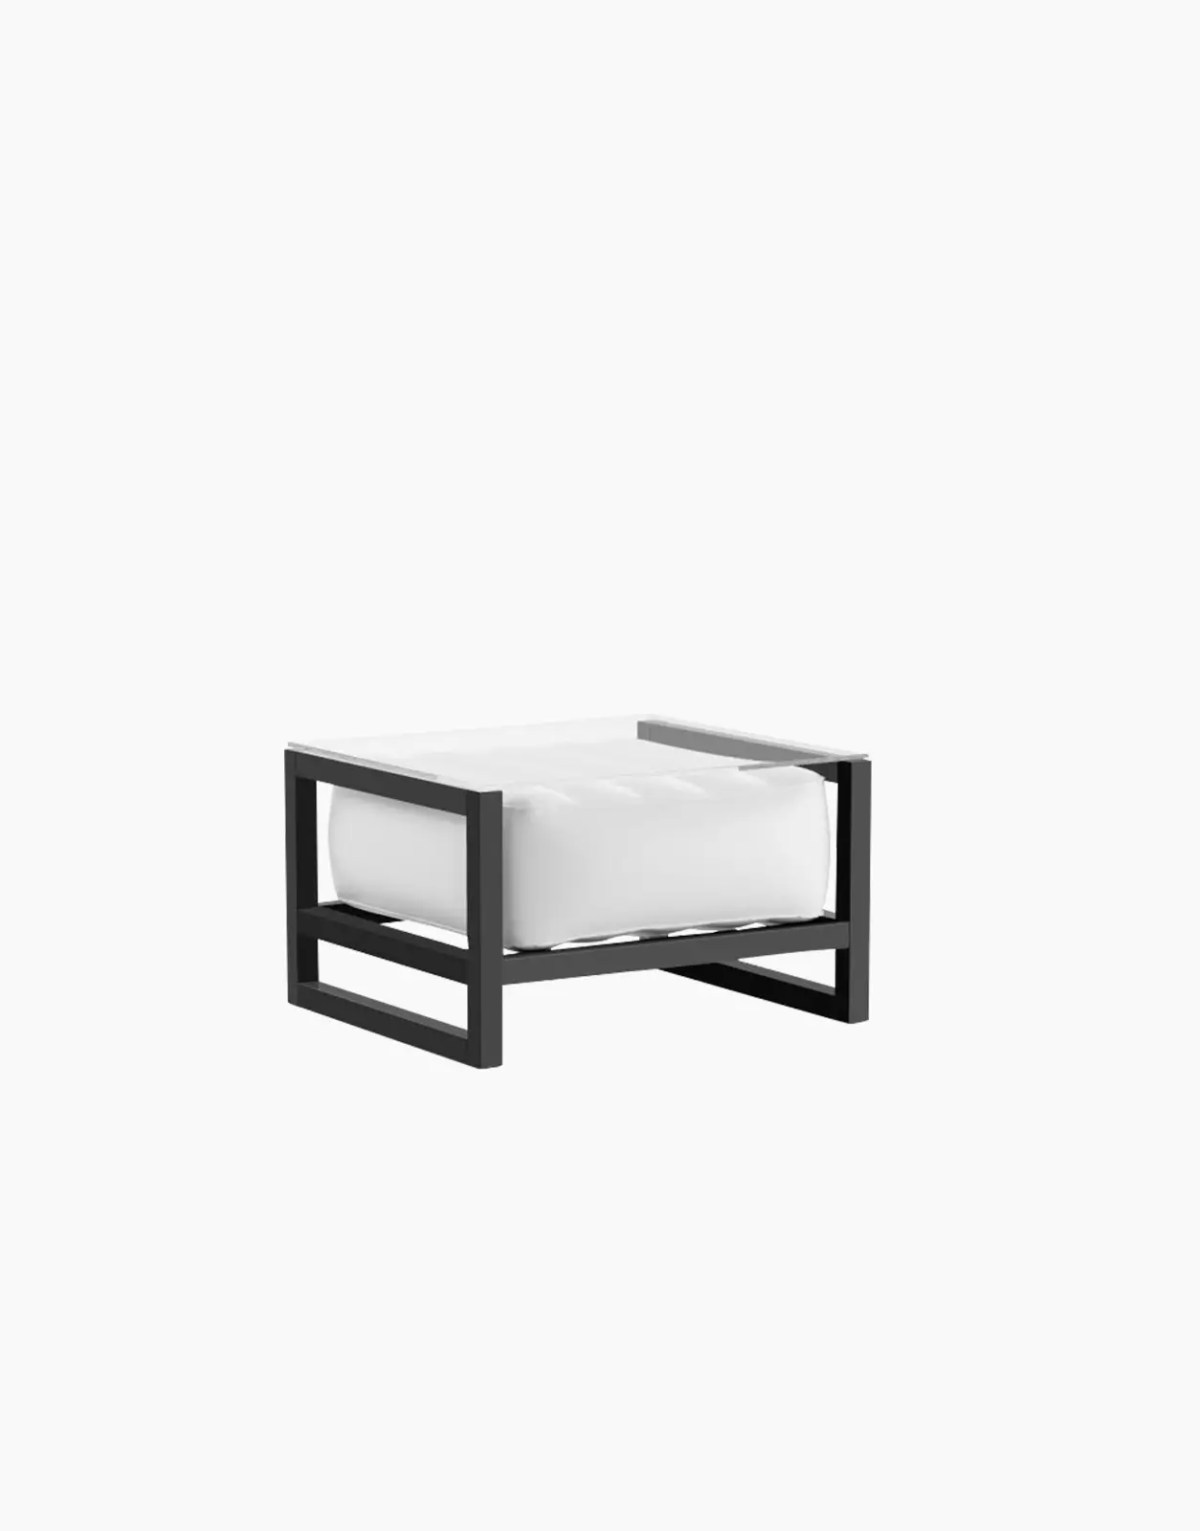 Revendeur de Mojow solution design fr mobilier table basse Yoko blanc opaque